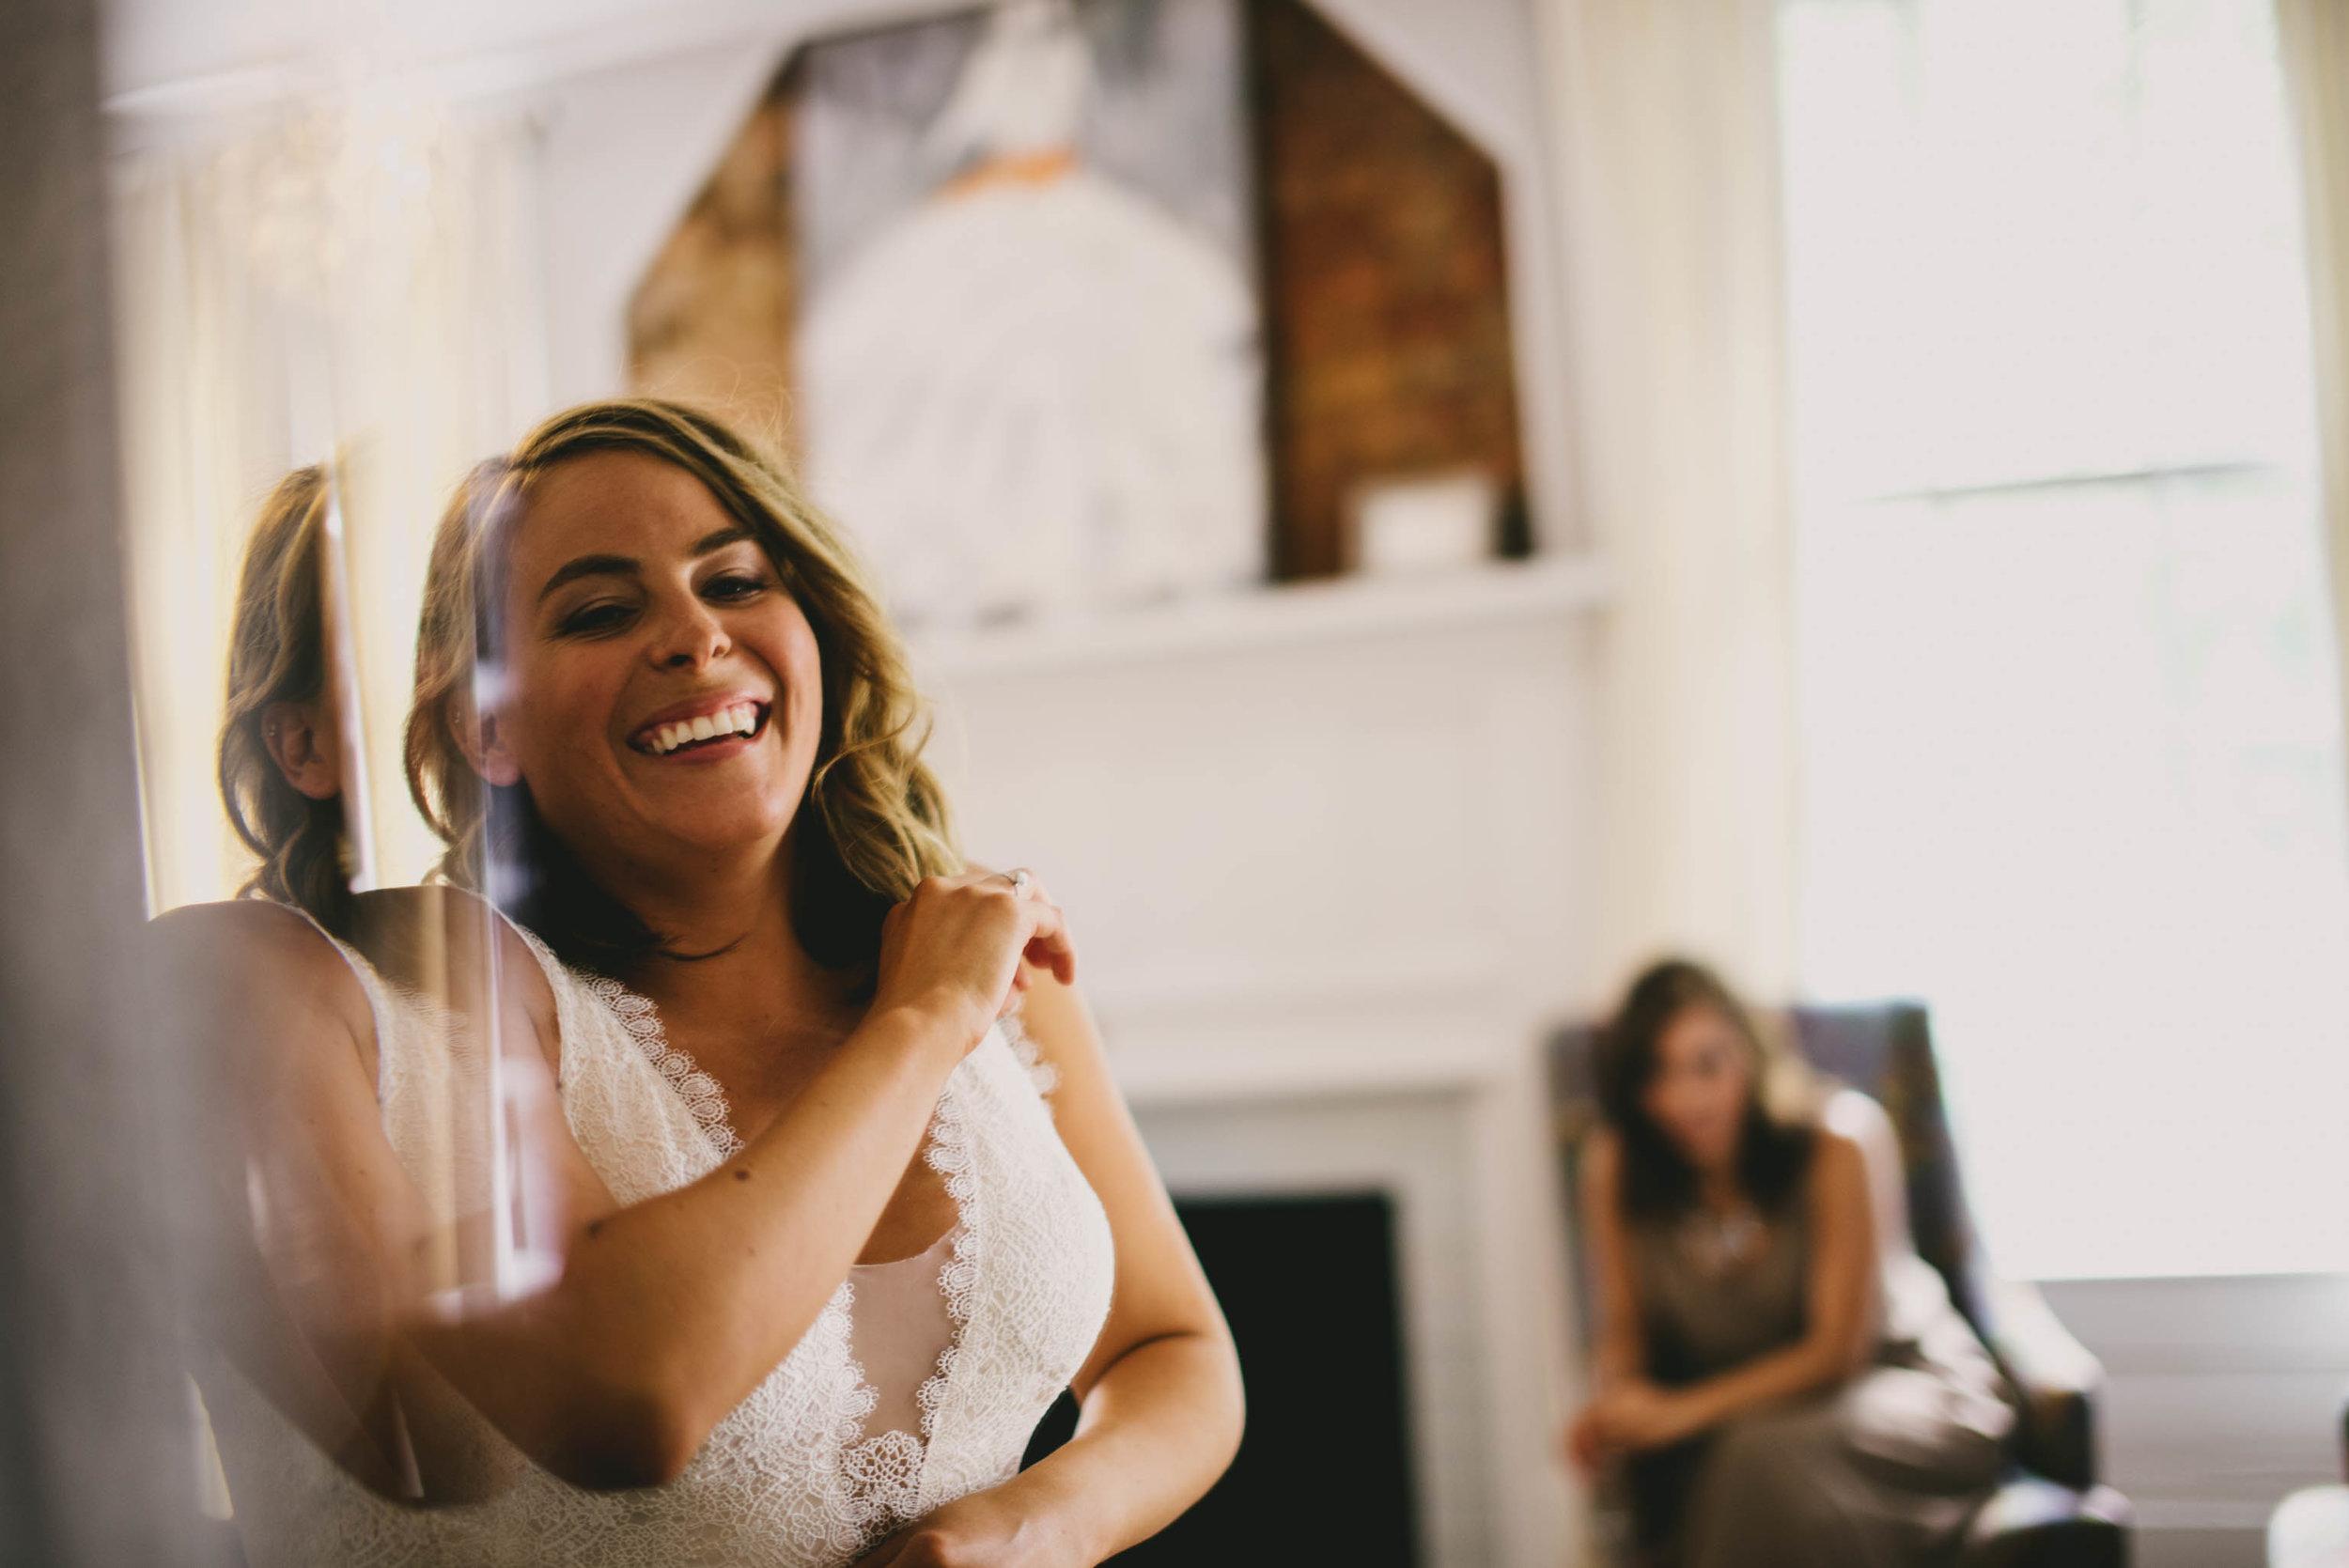 mims-house-wedding-bride-getting-her-BHLDN-dress-on.jpg